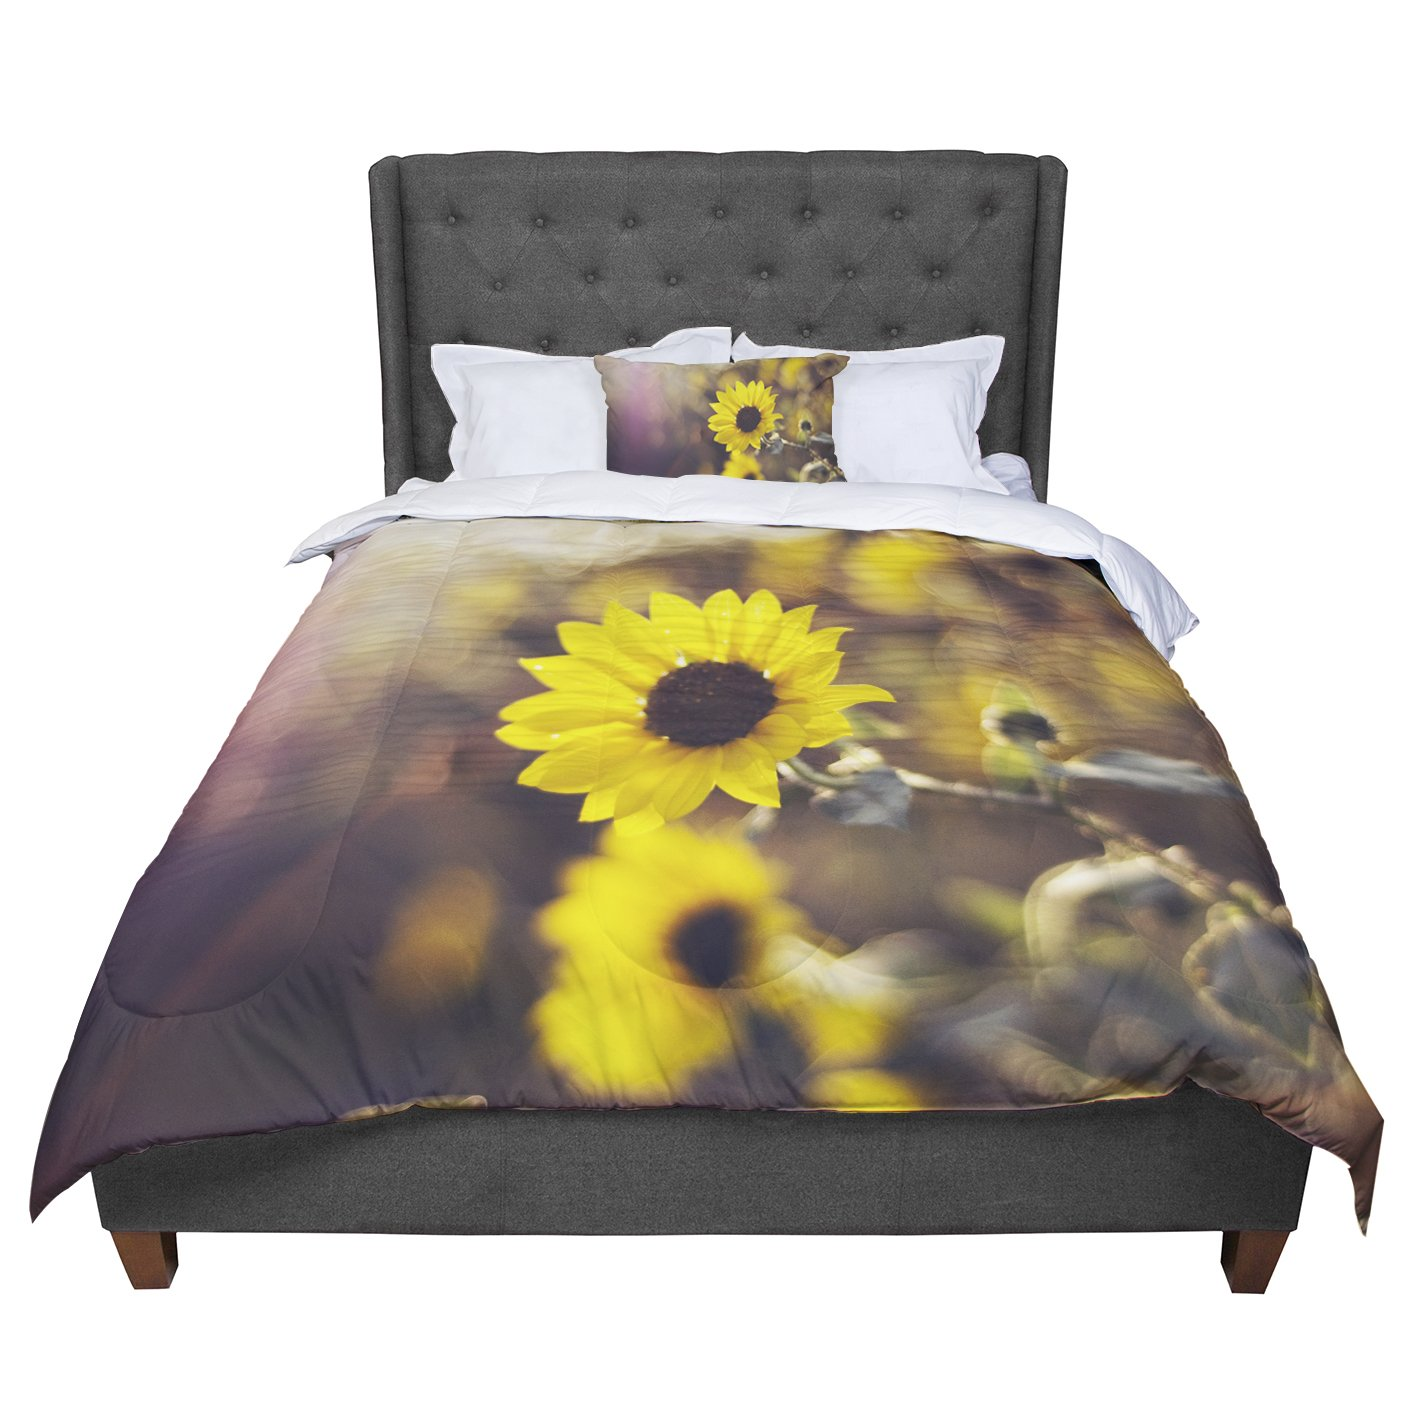 Cal King Comforter 104 X 88 KESS InHouse Libertad Leal Magic Light Flower King